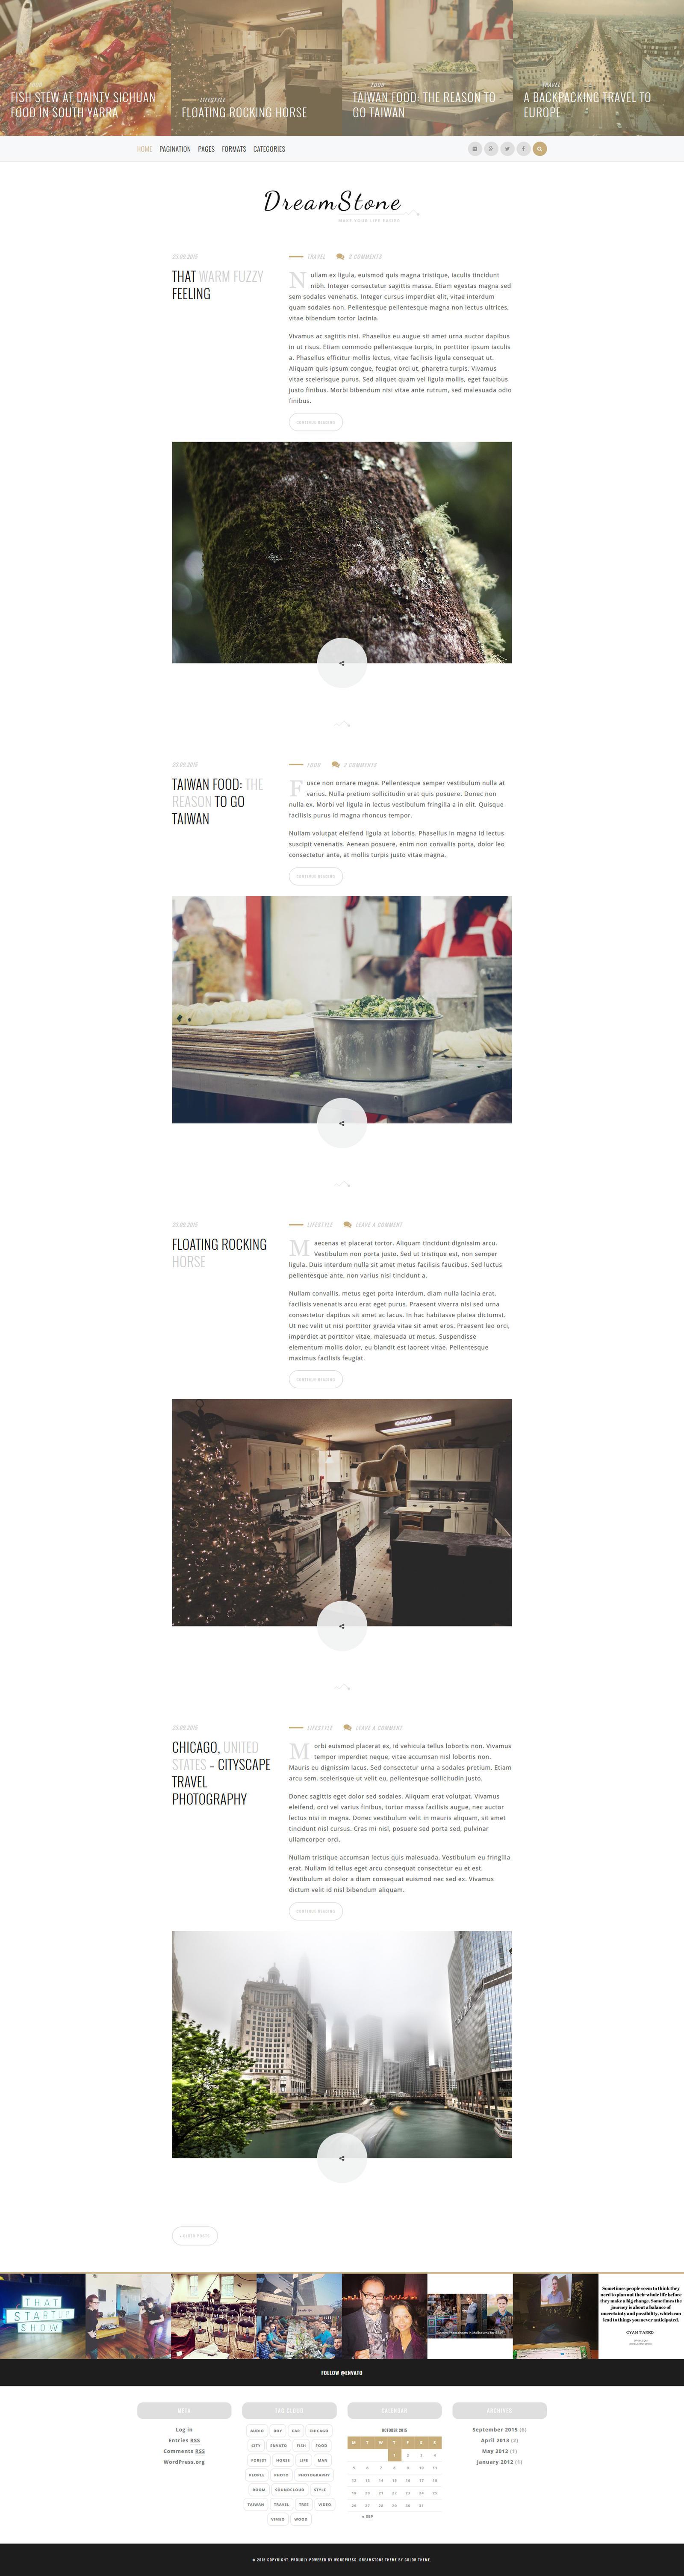 DreamStone - Personal WordPress Blog Theme by ZERGEV